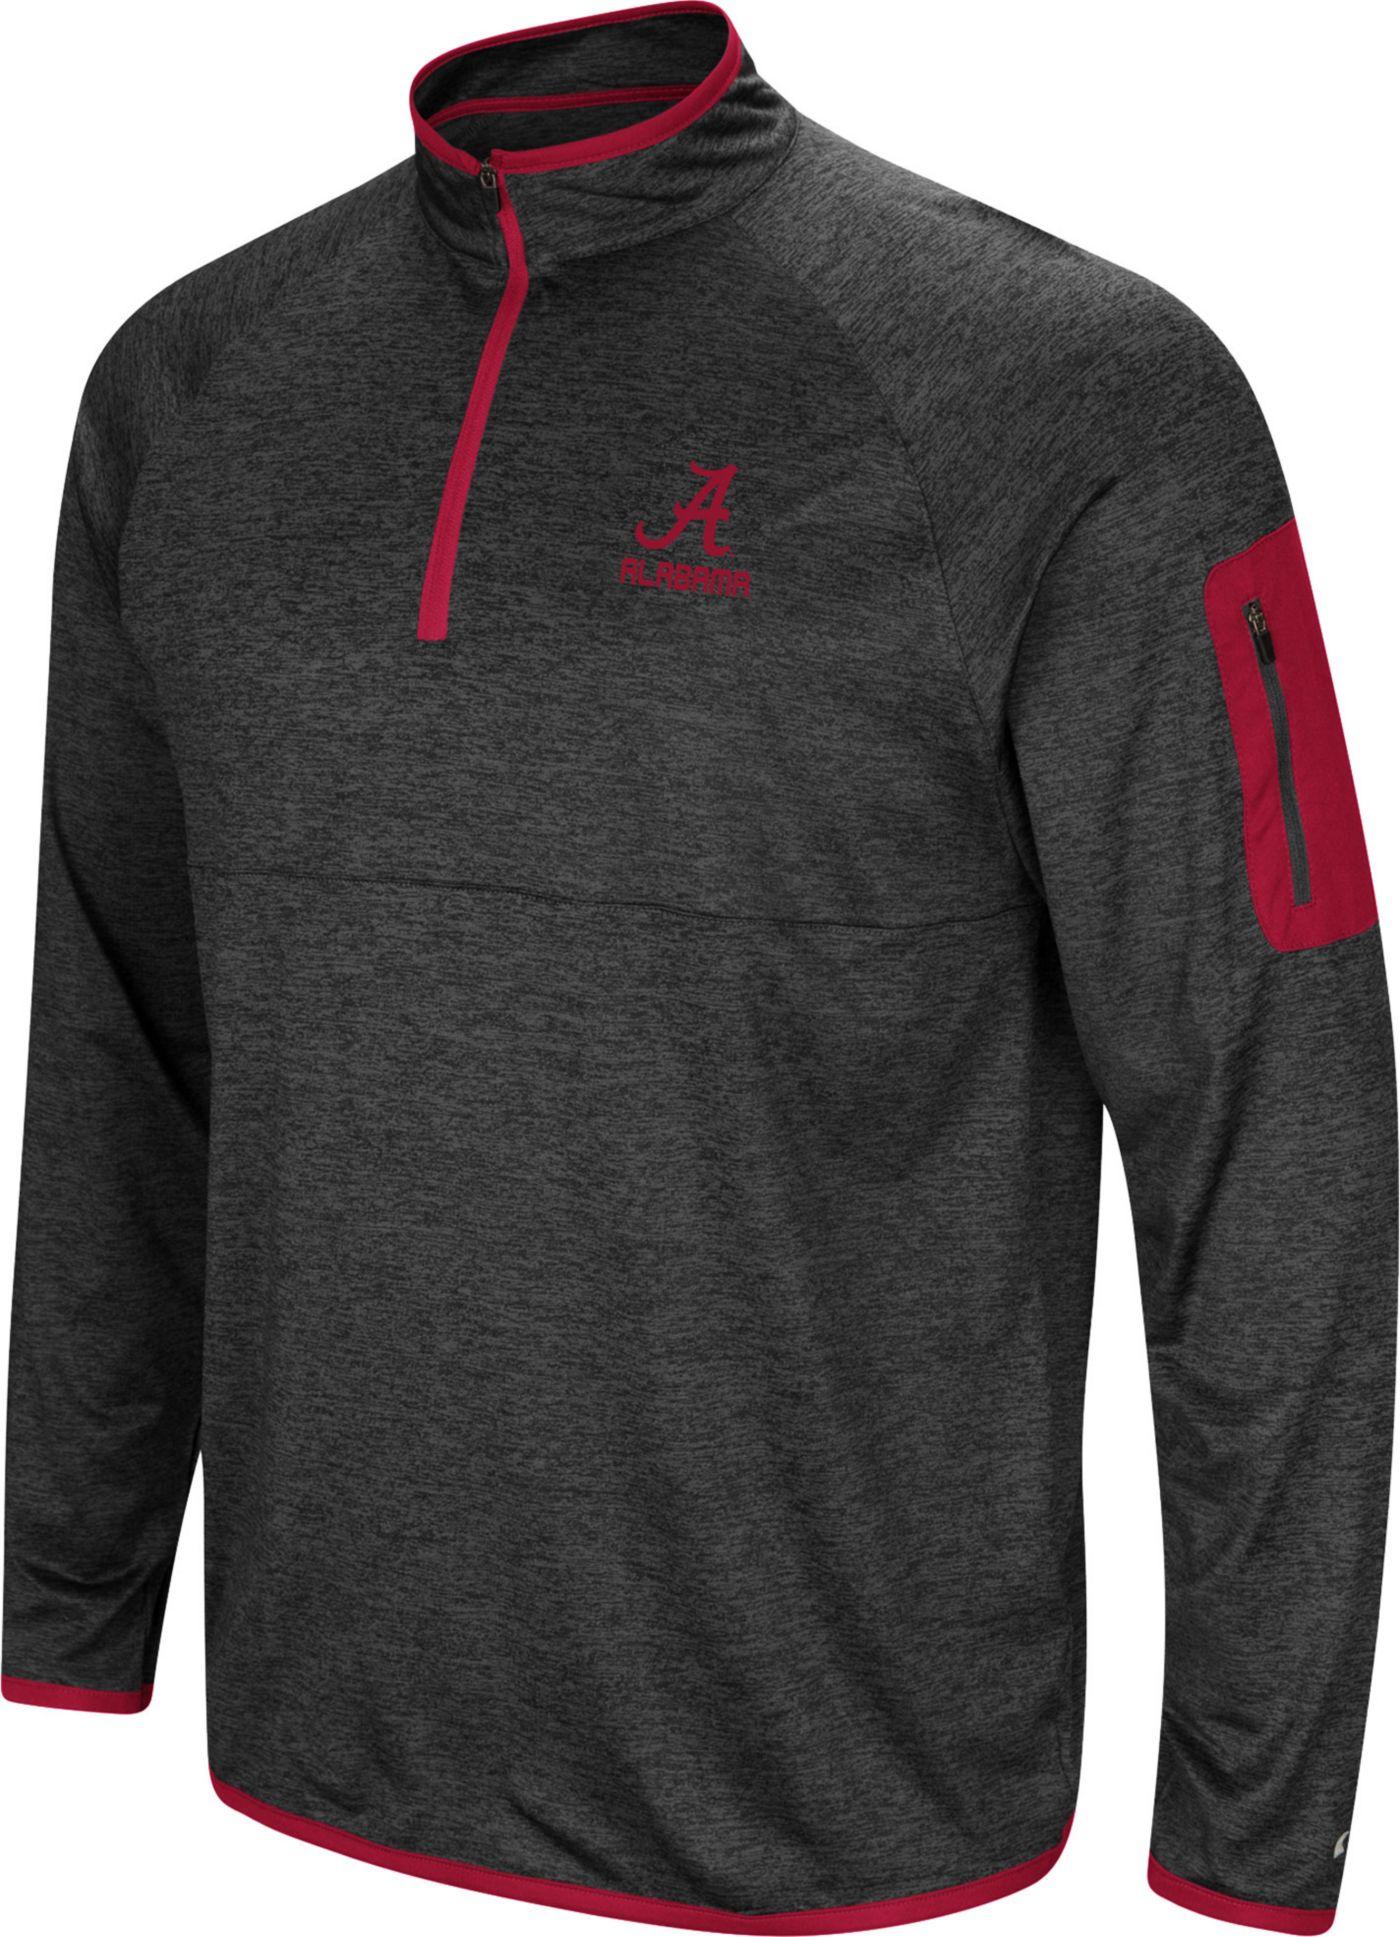 Colosseum Men's Alabama Crimson Tide Grey Indus River Quarter-Zip Shirt